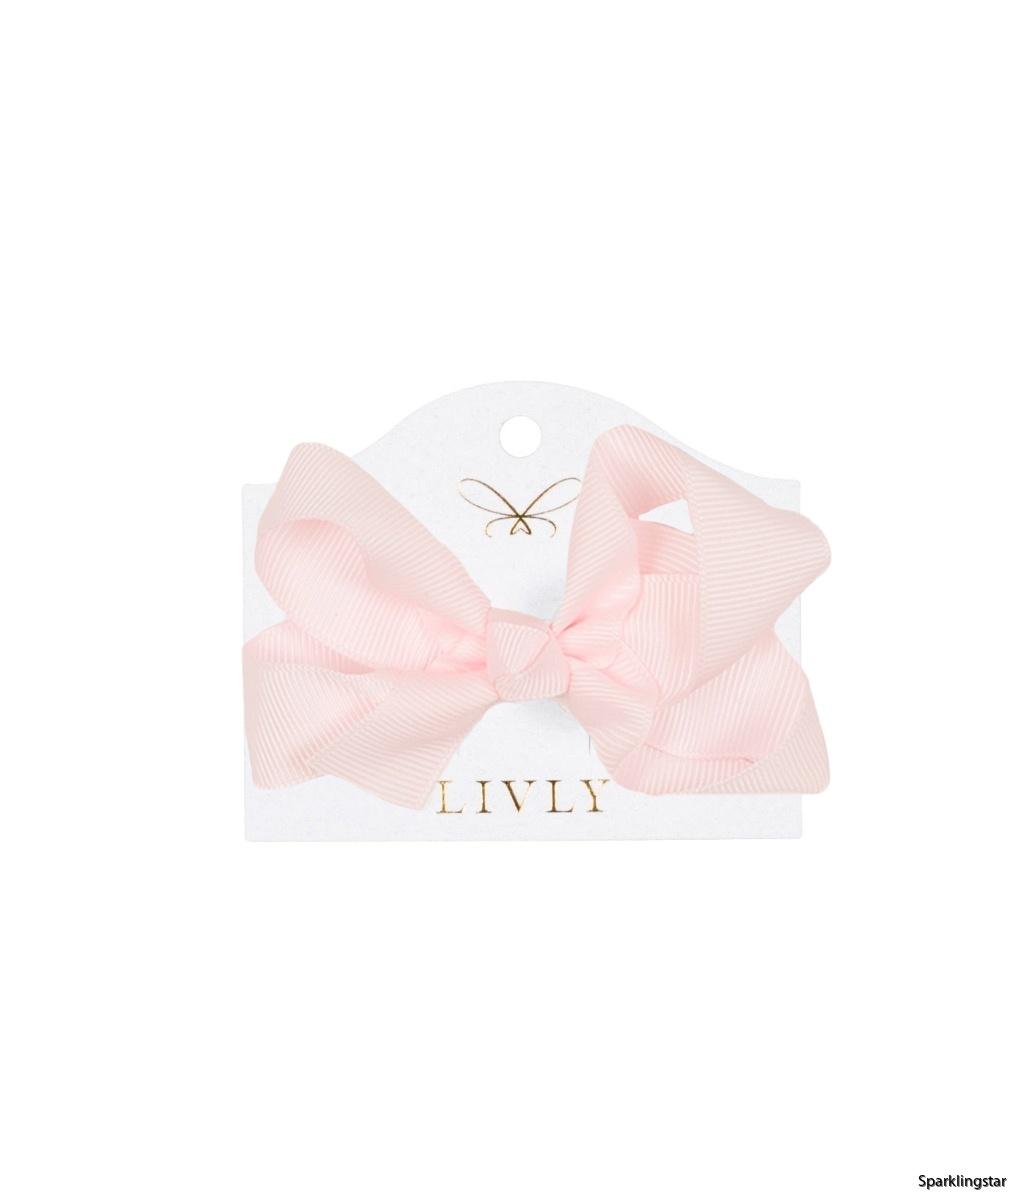 Livly Medium Bow Cotton Candy